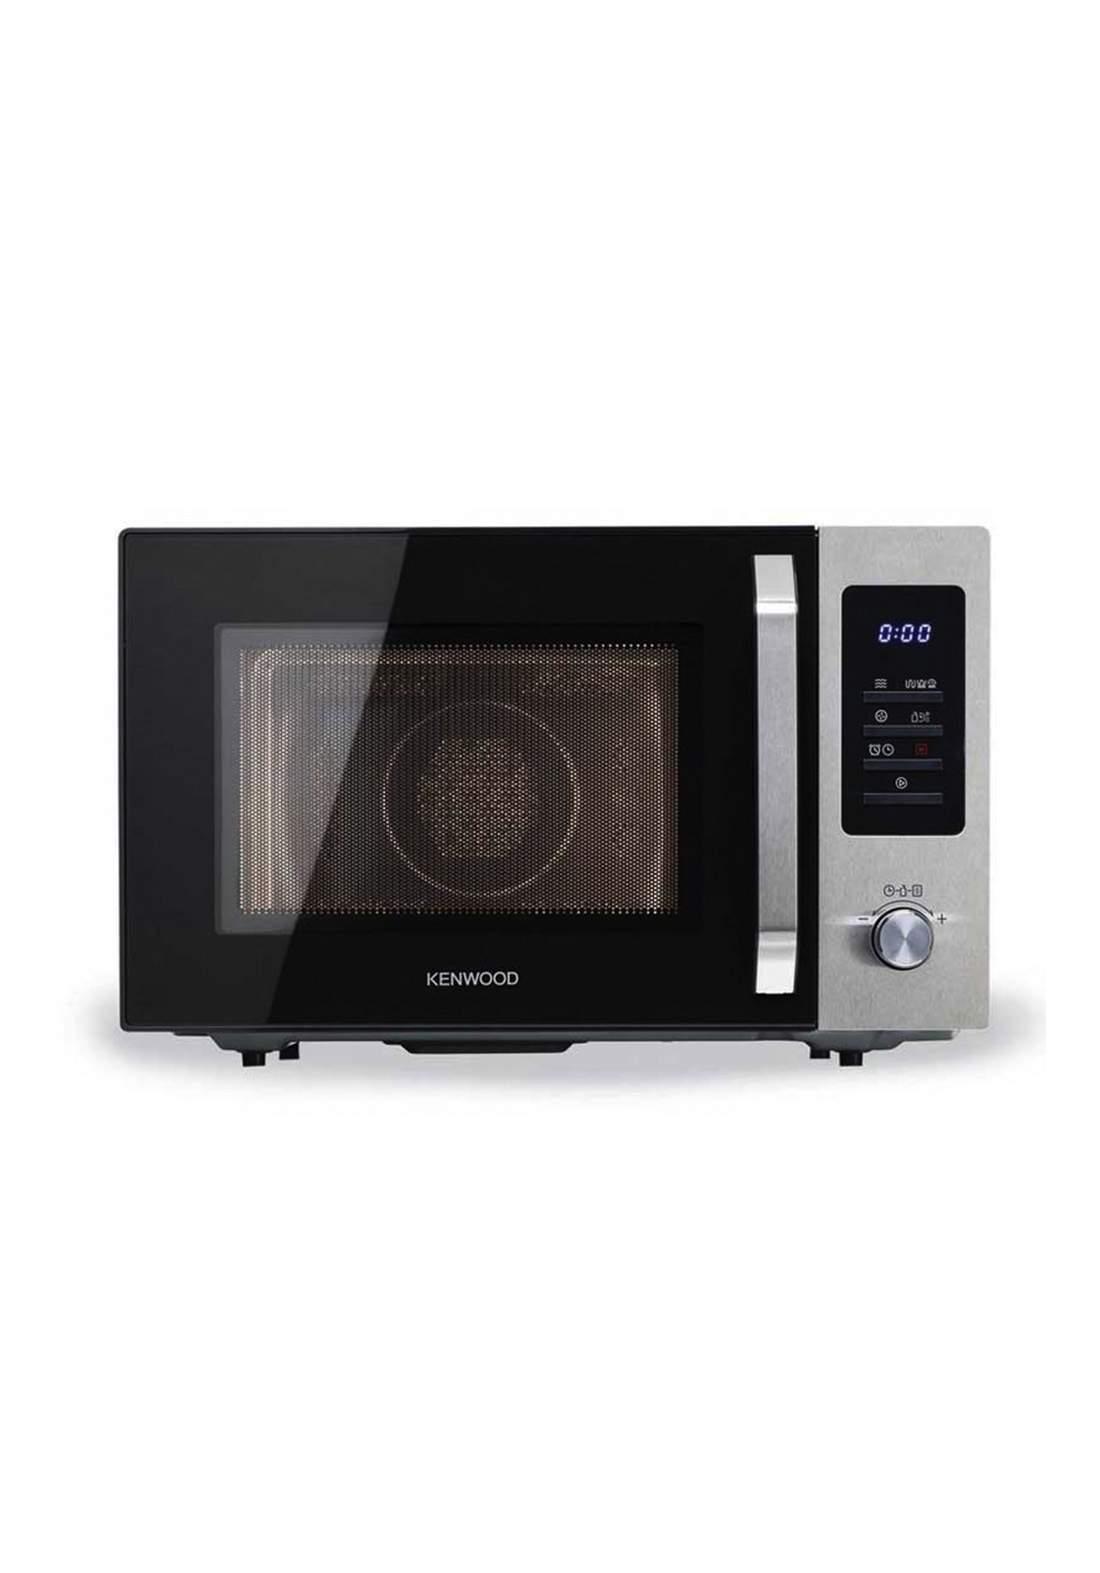 Kenwood MWM31  Microwave Oven  مايكروويف طعام